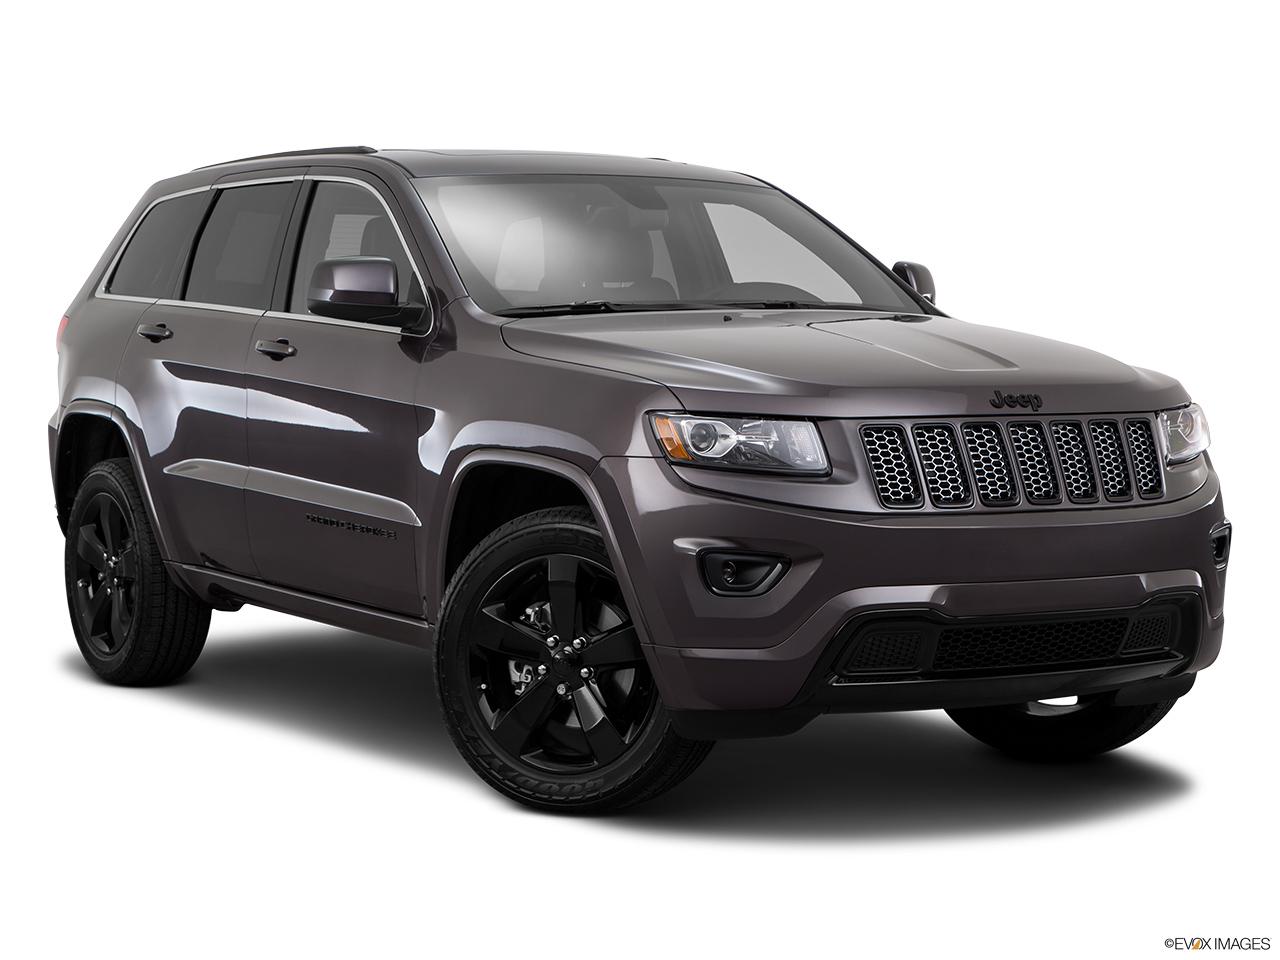 2015 jeep grand cherokee 4wd 4 door altitude. Black Bedroom Furniture Sets. Home Design Ideas